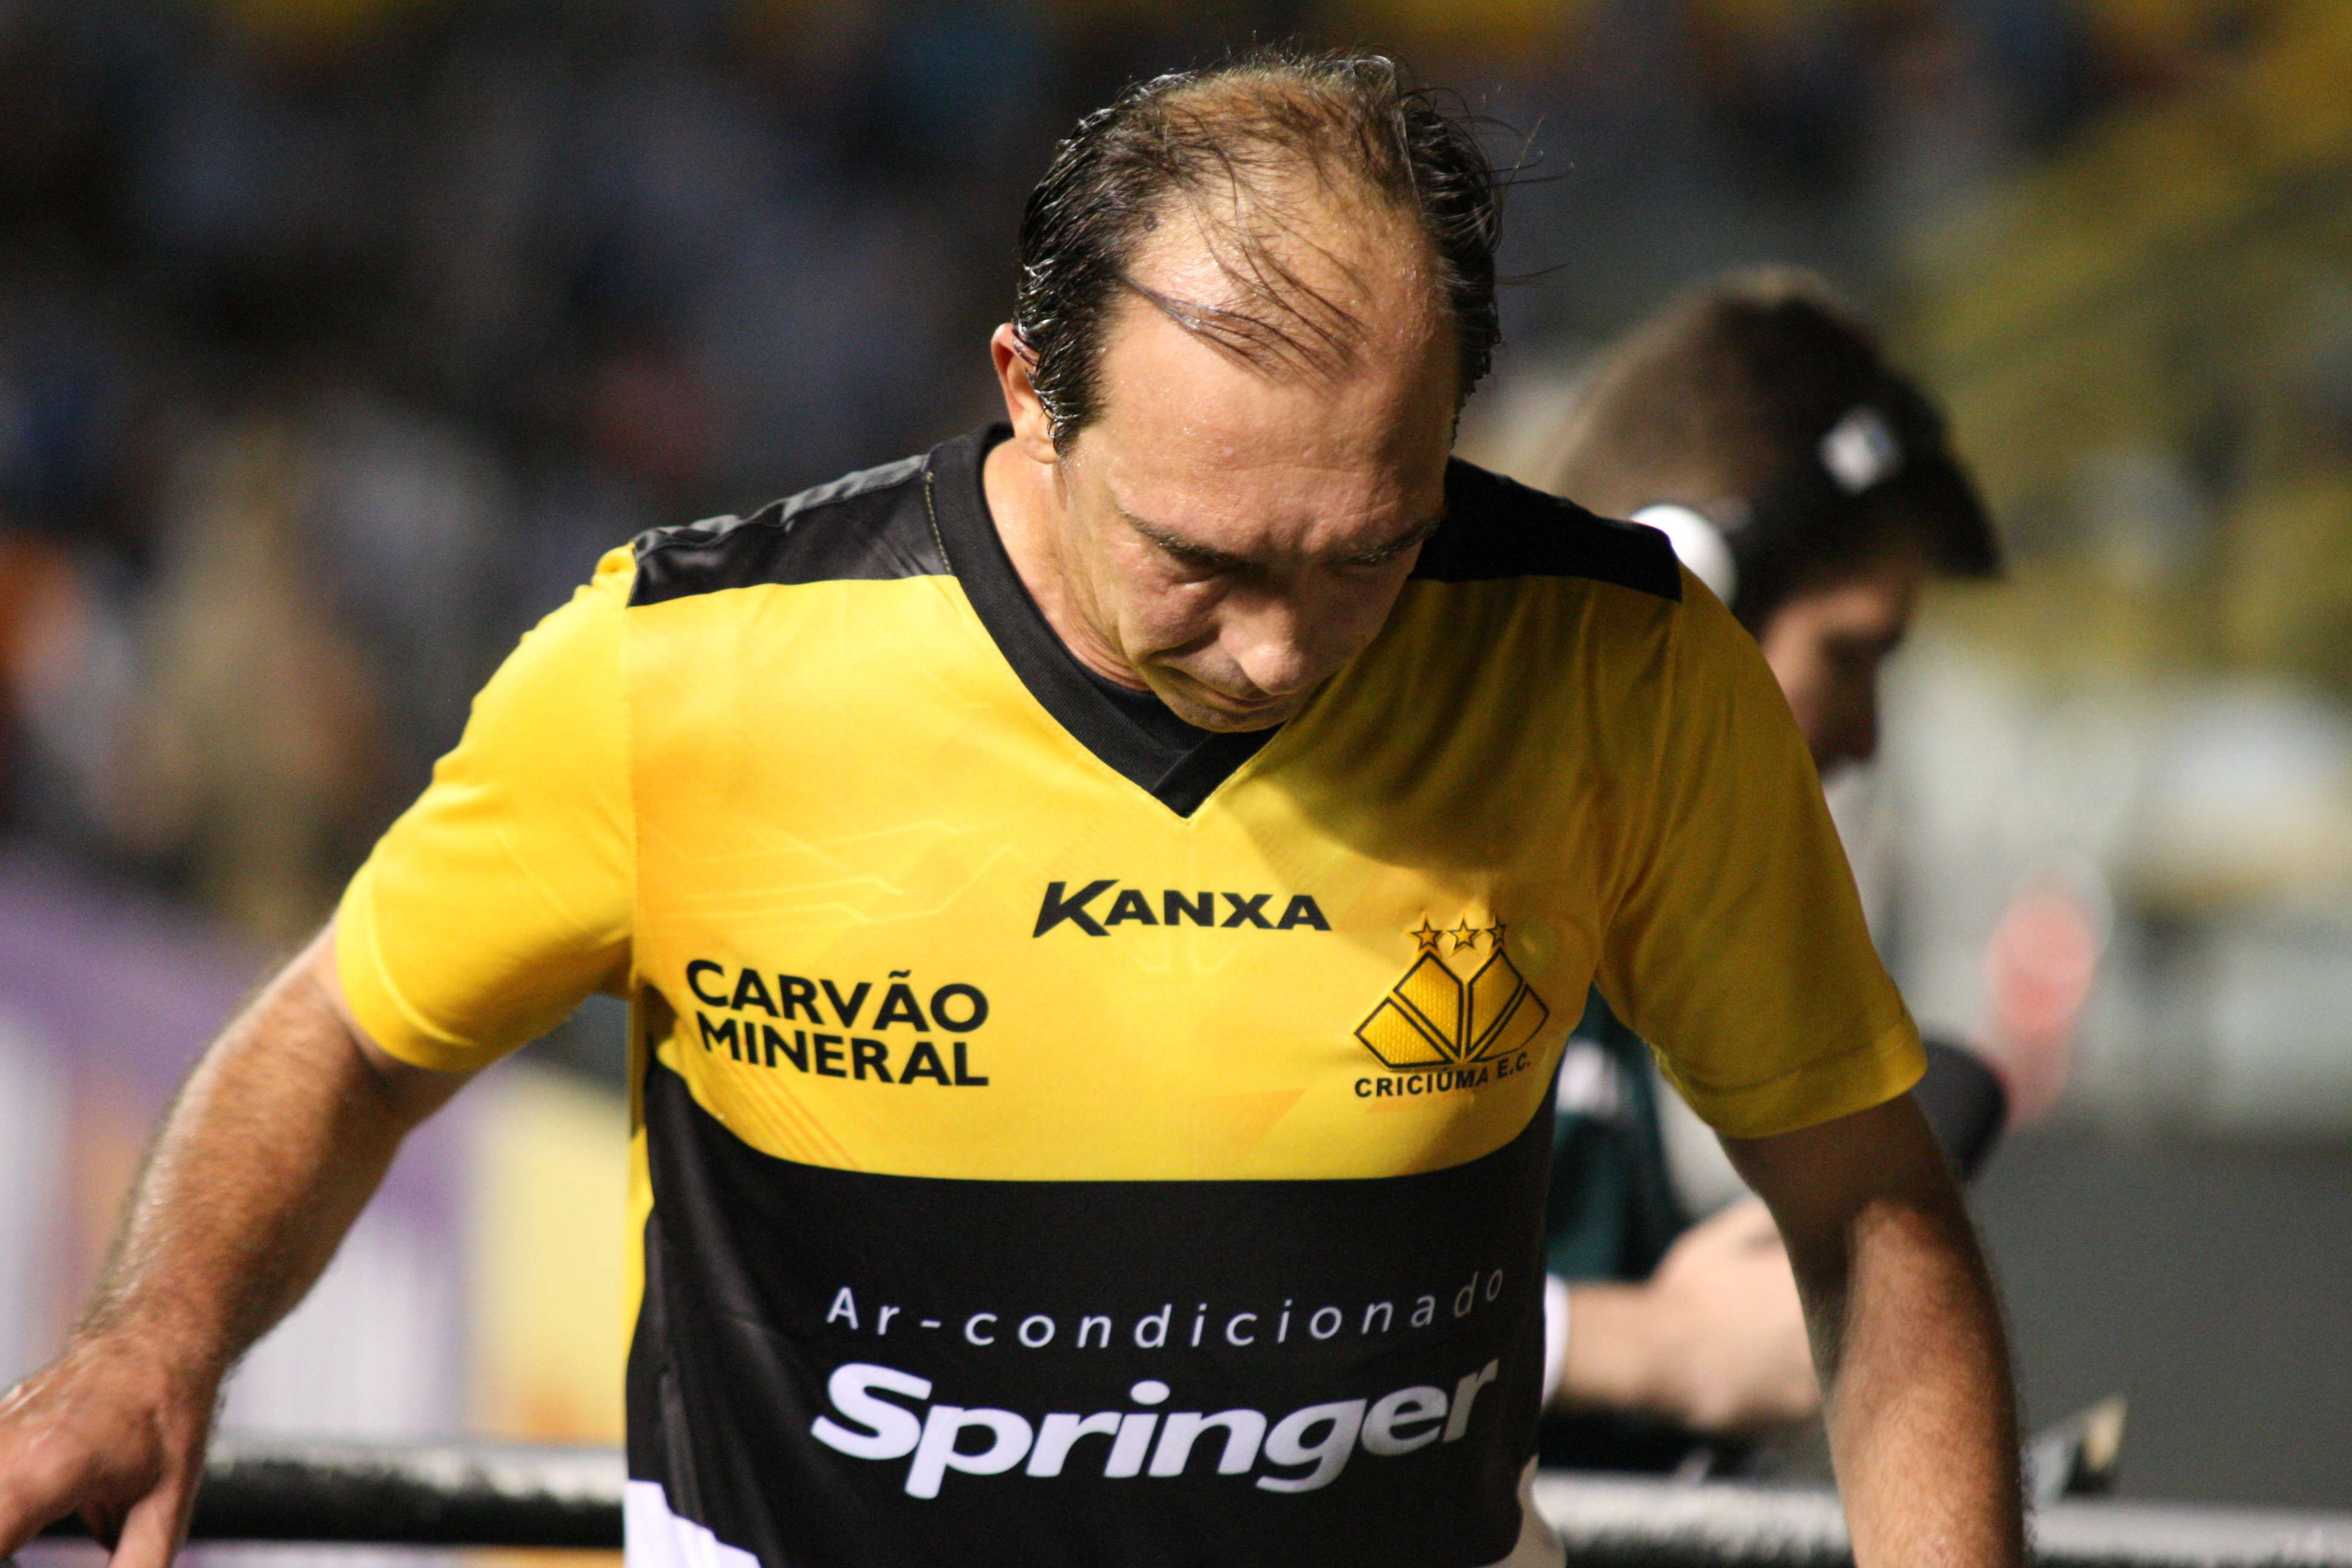 Paulo Baier sai cabisbaixo após derrota no Heriberto Hülse Foto: Alan Pedro/Getty Images